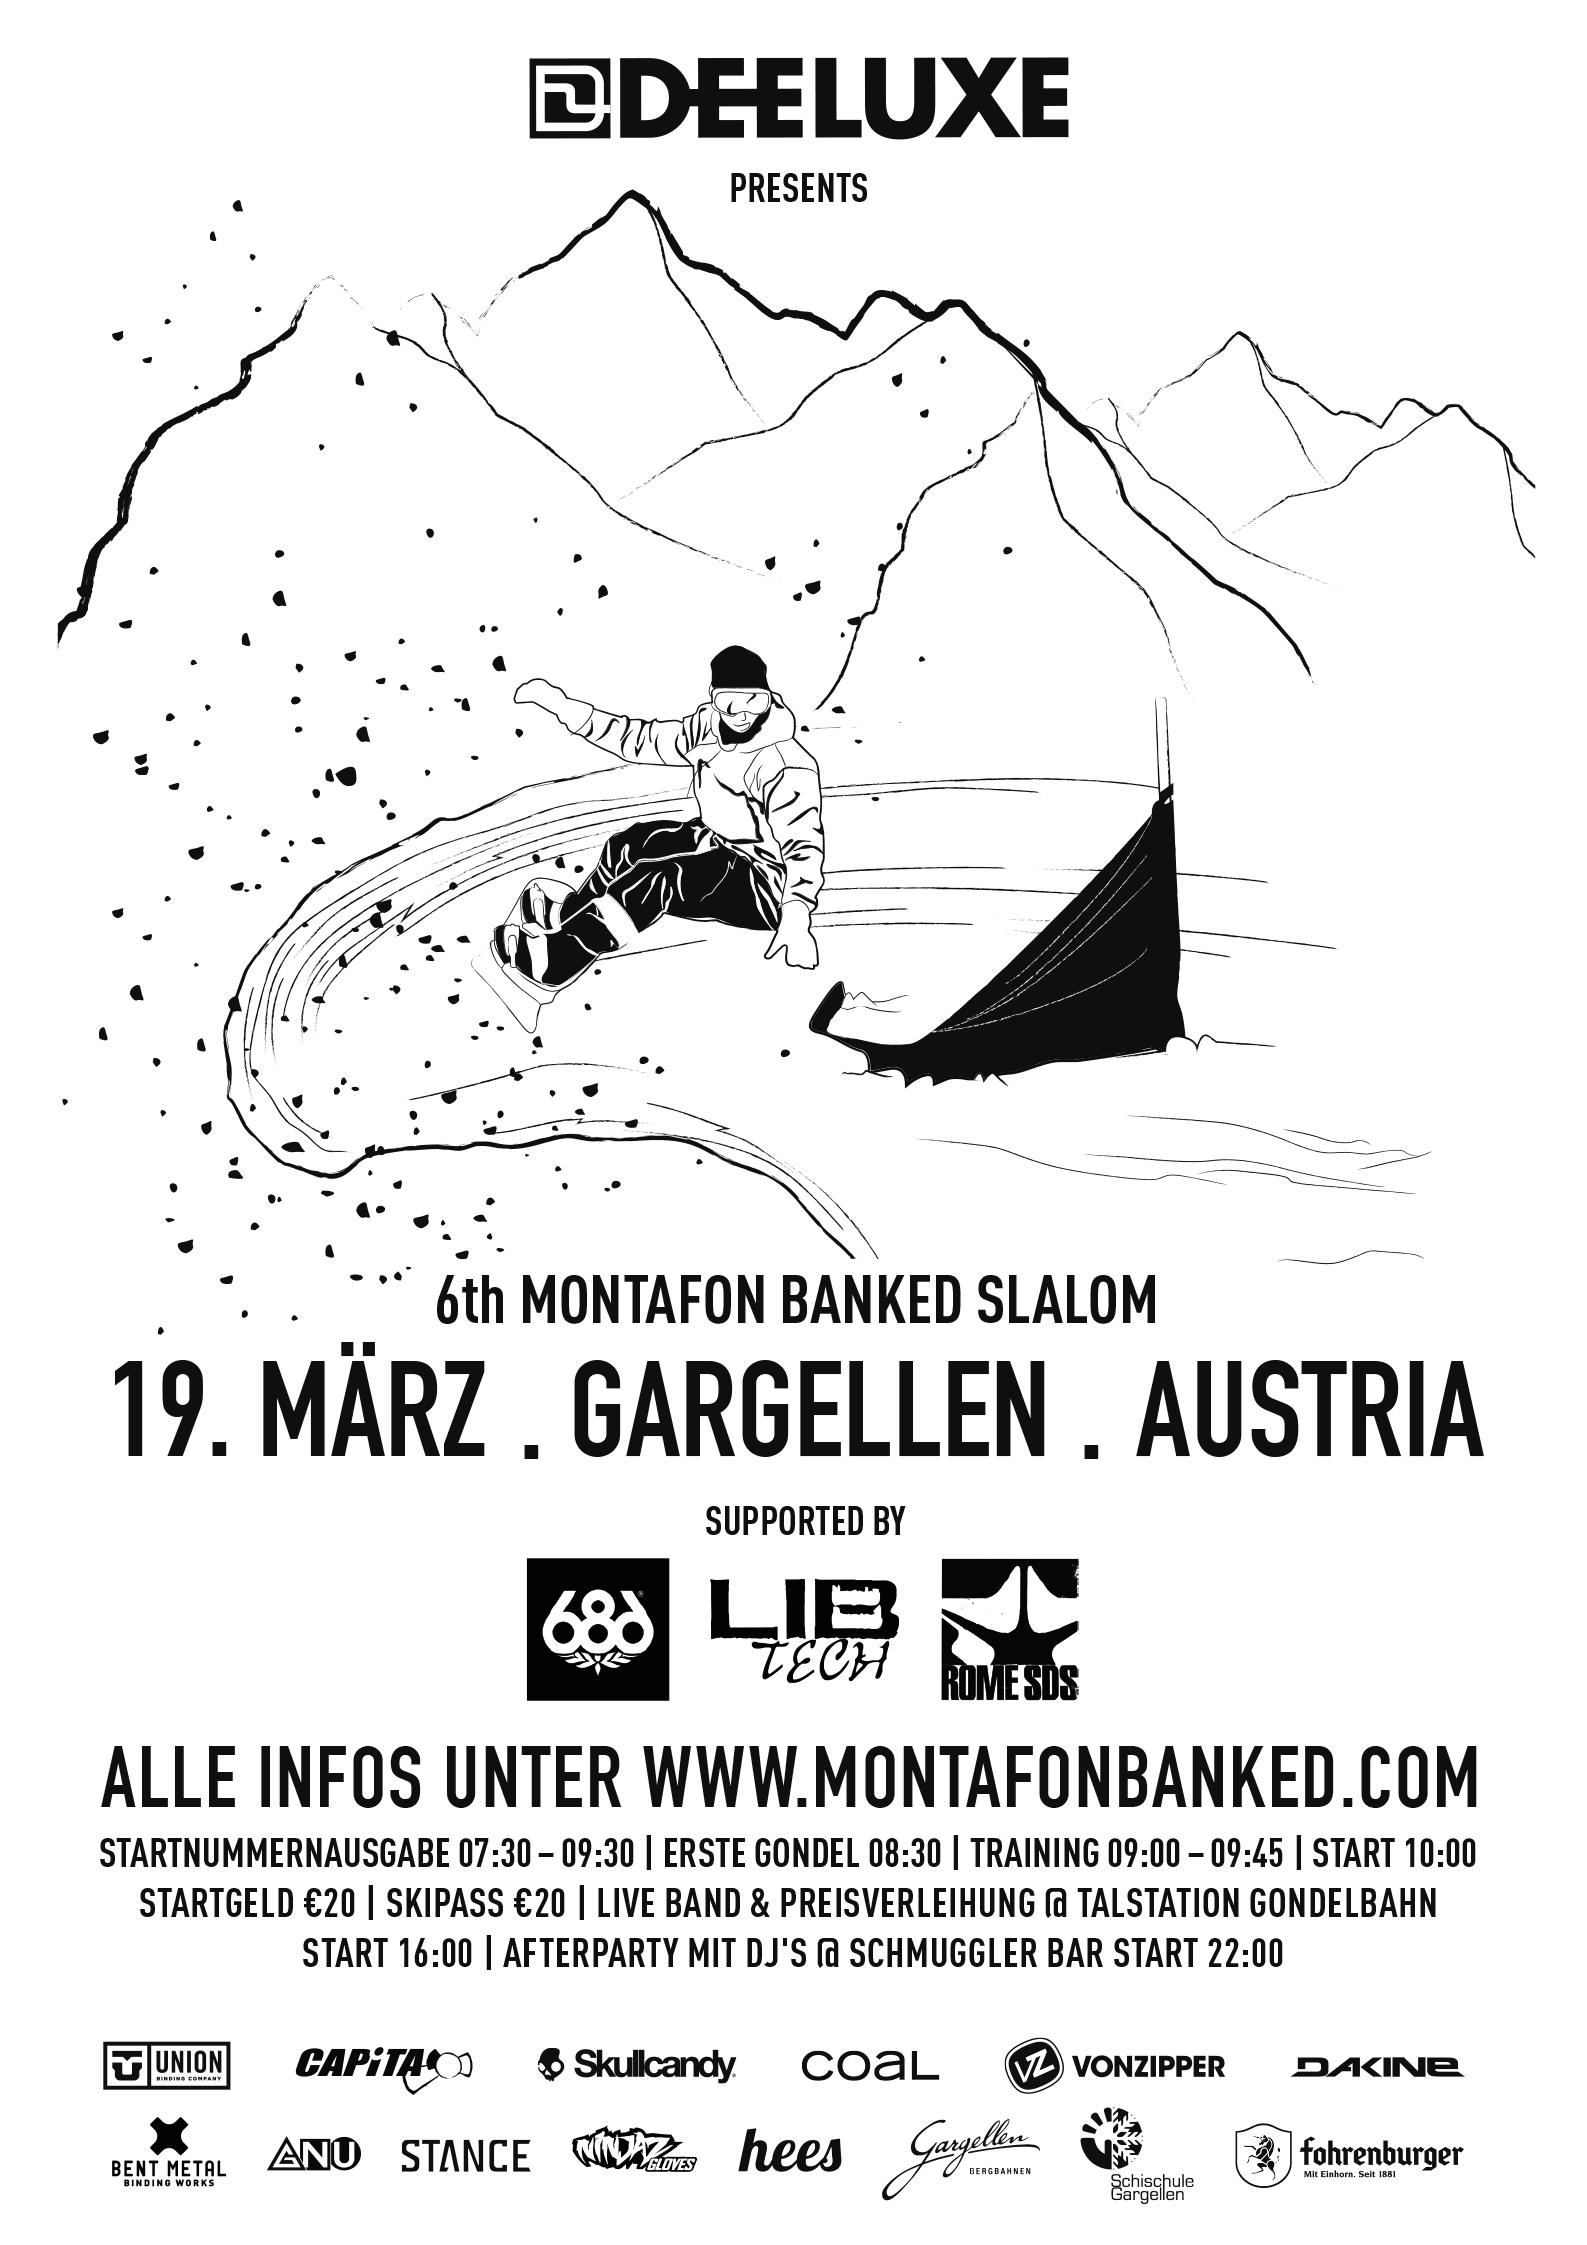 Montafon Banked Slalom 2016 - Flyer